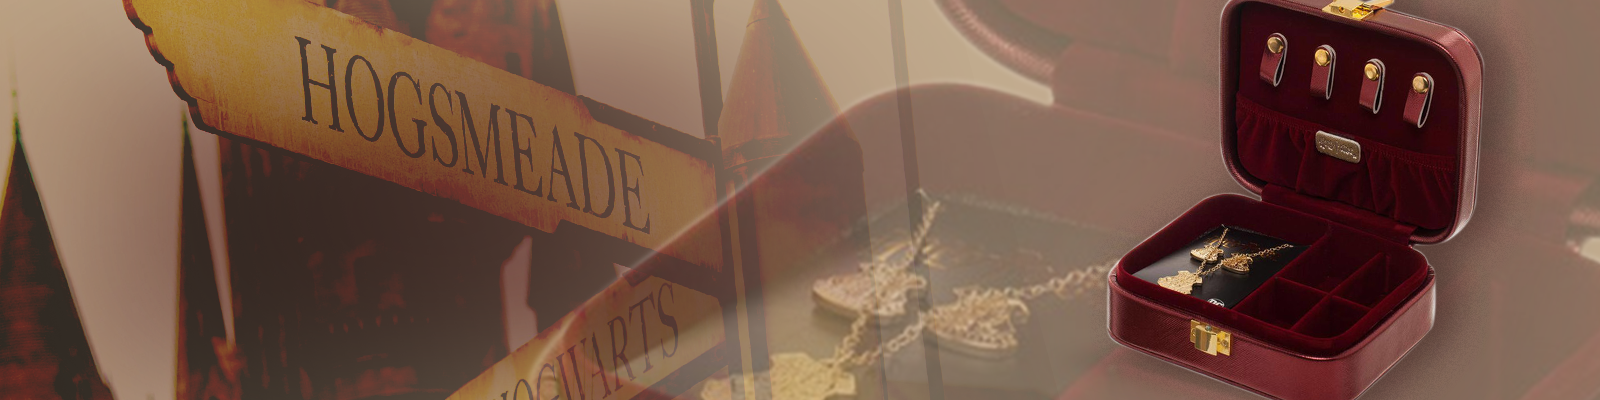 Jewelry Box + Hogwarts Set